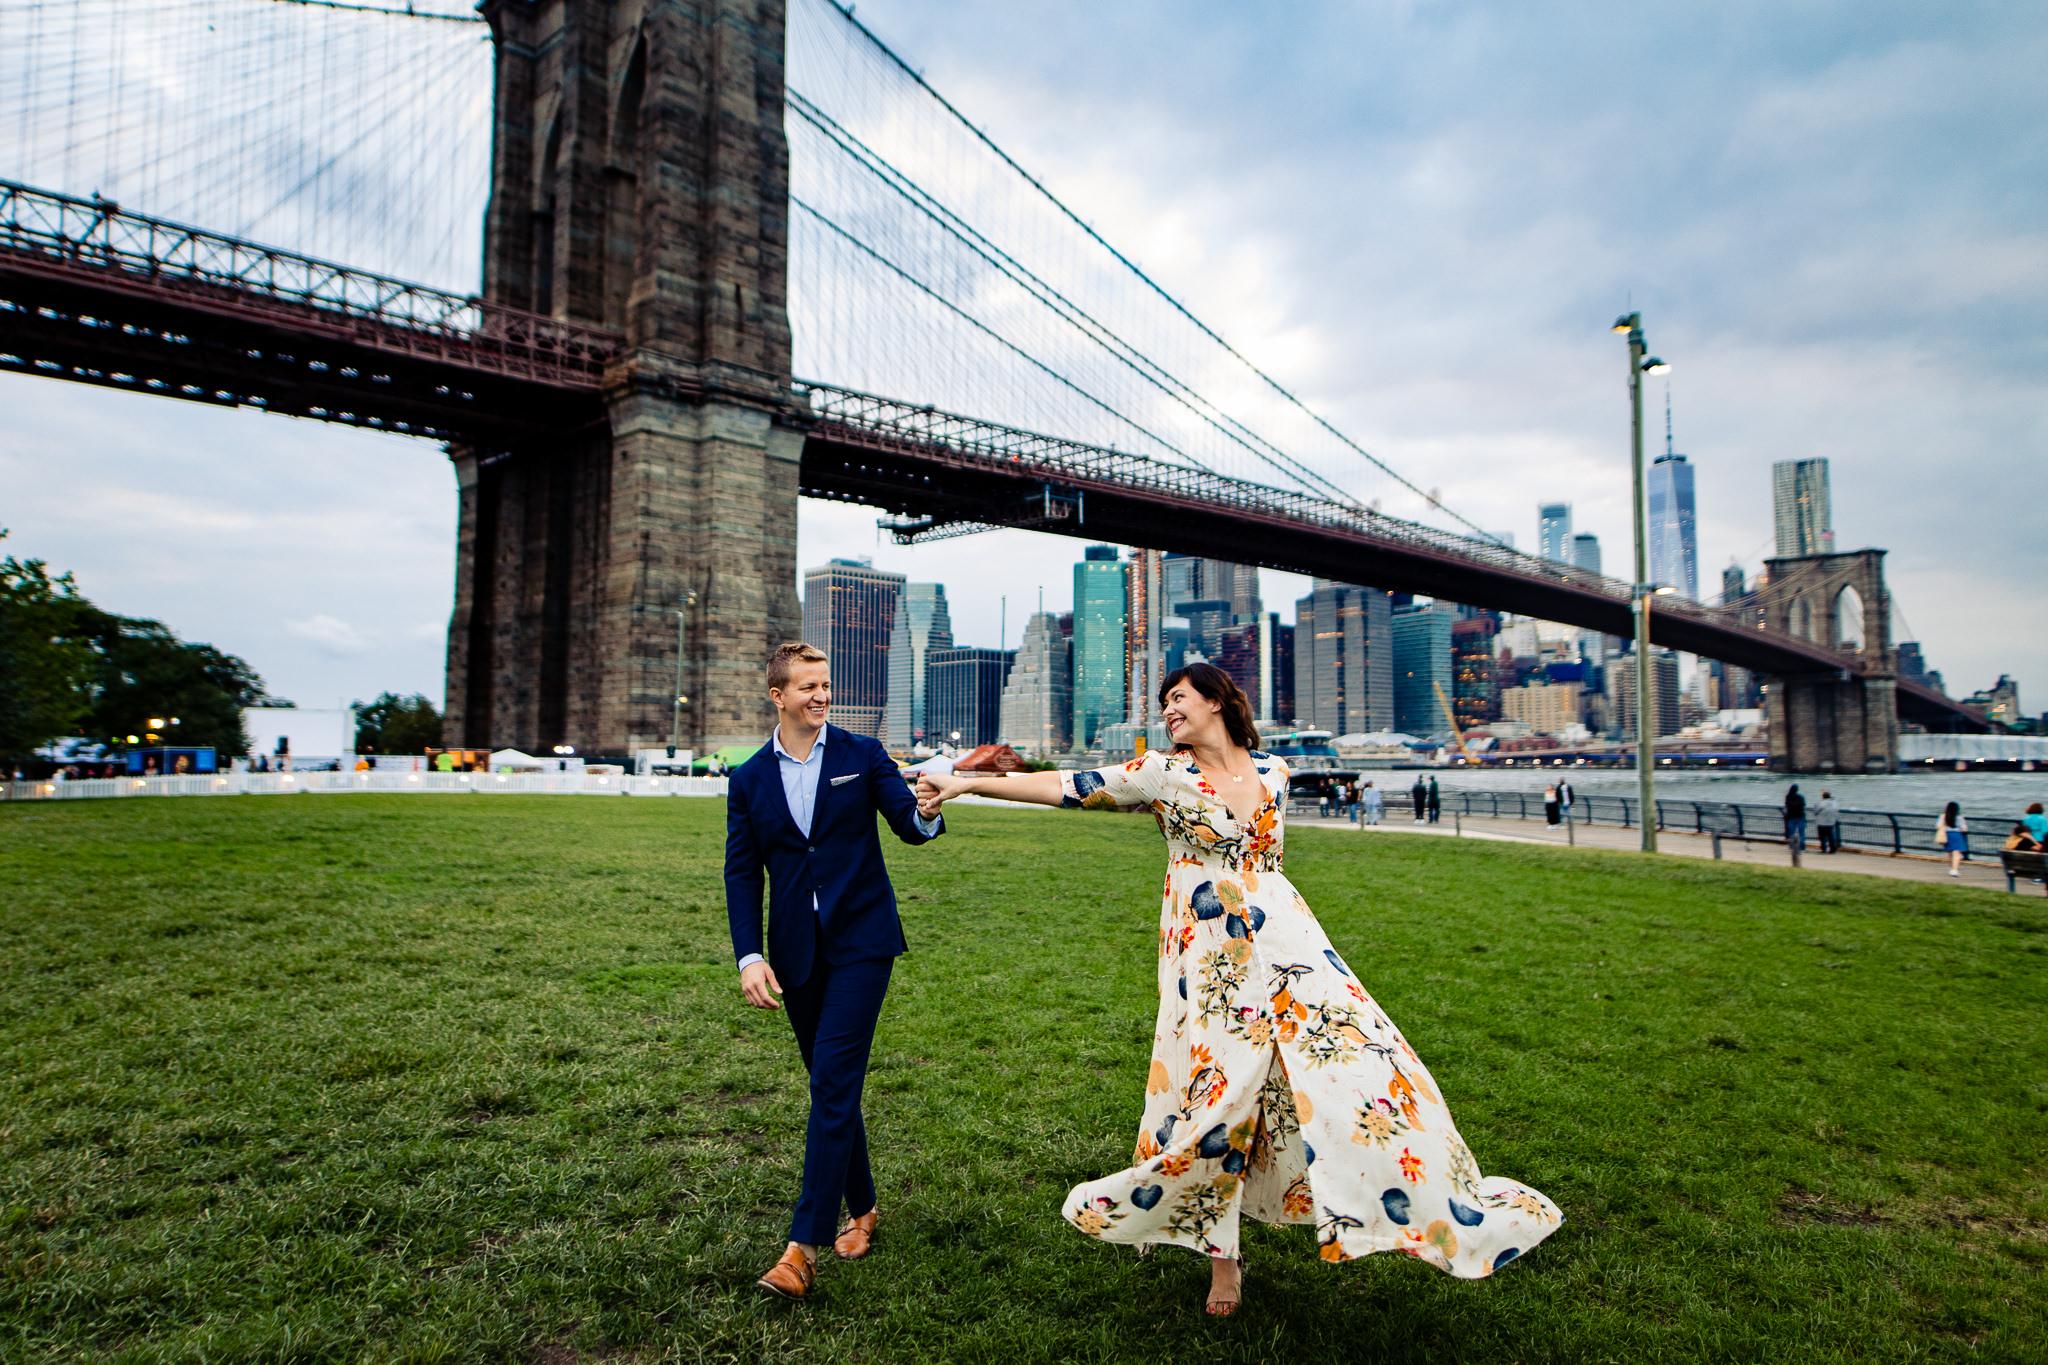 best austin wedding photographer john winters photography